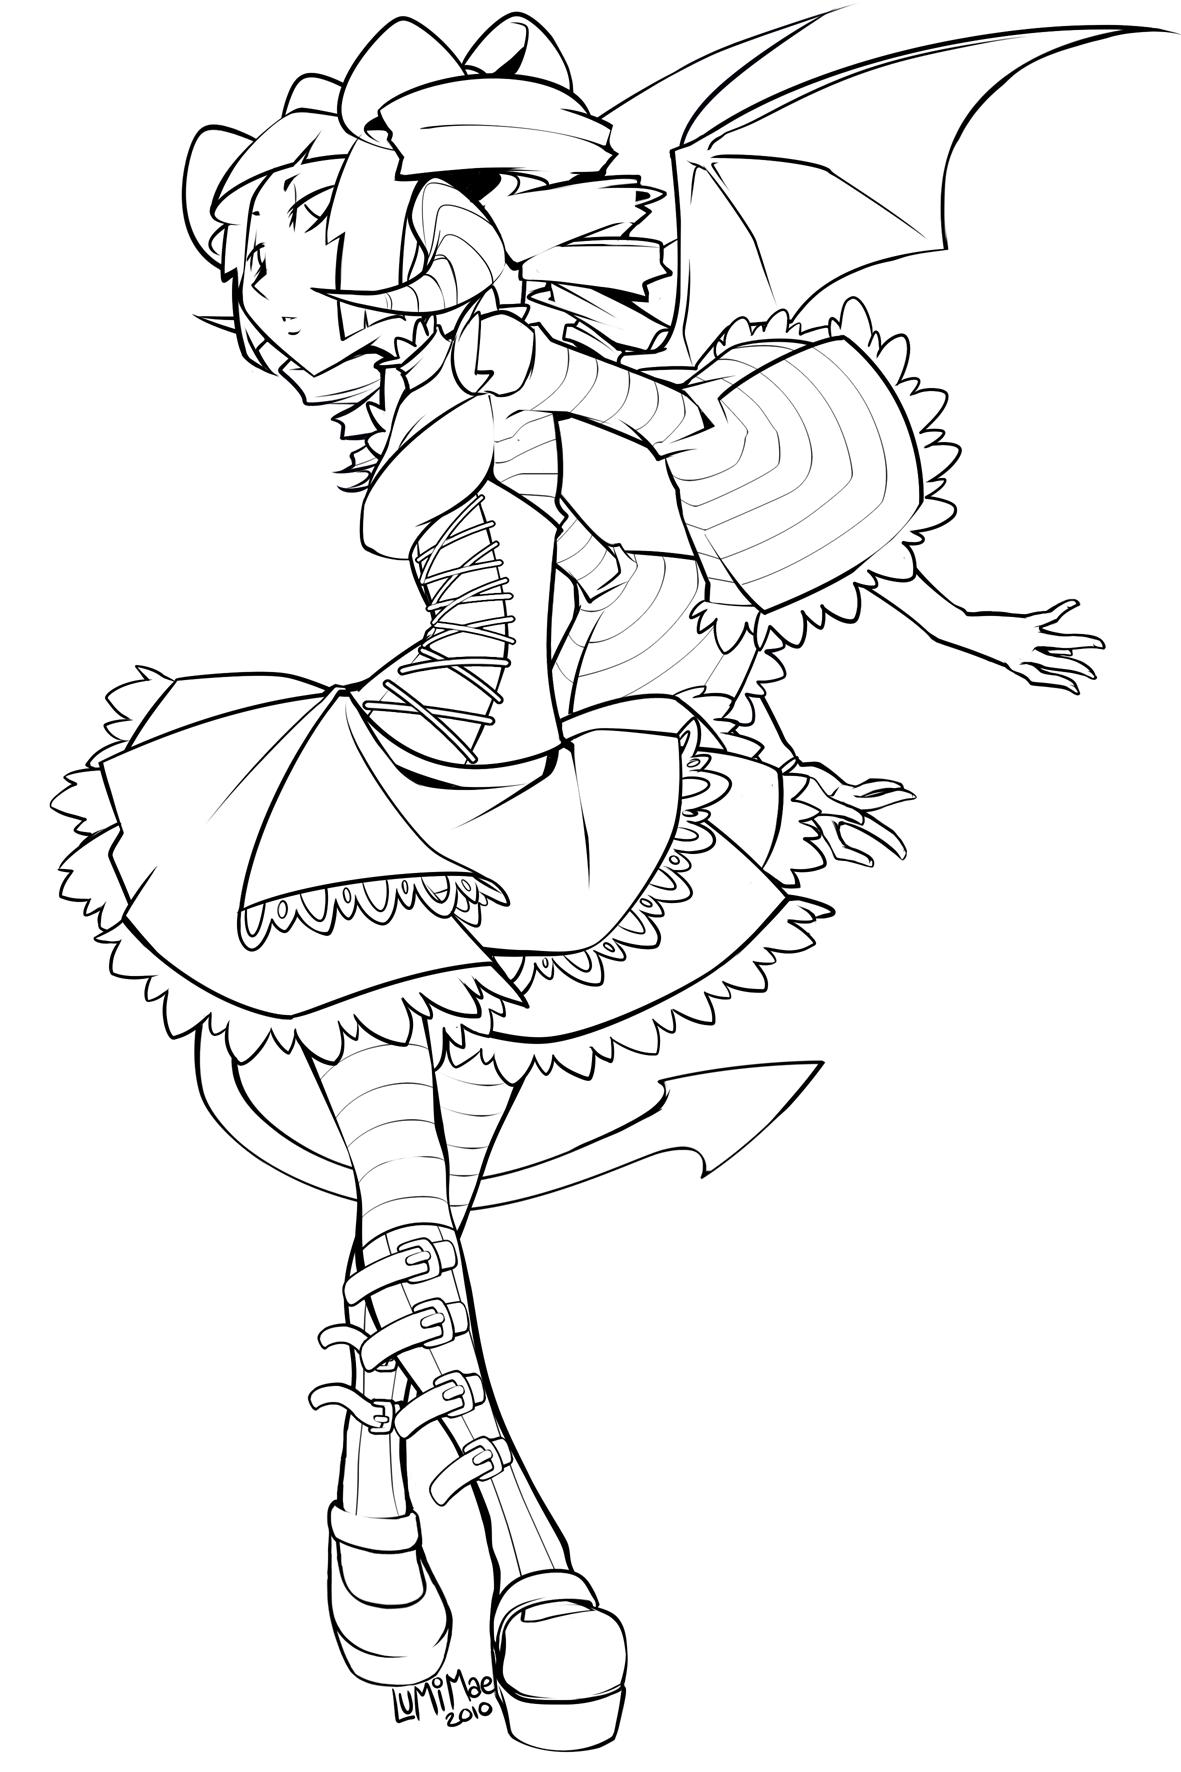 Succubus Lolita lineart by lumi-mae